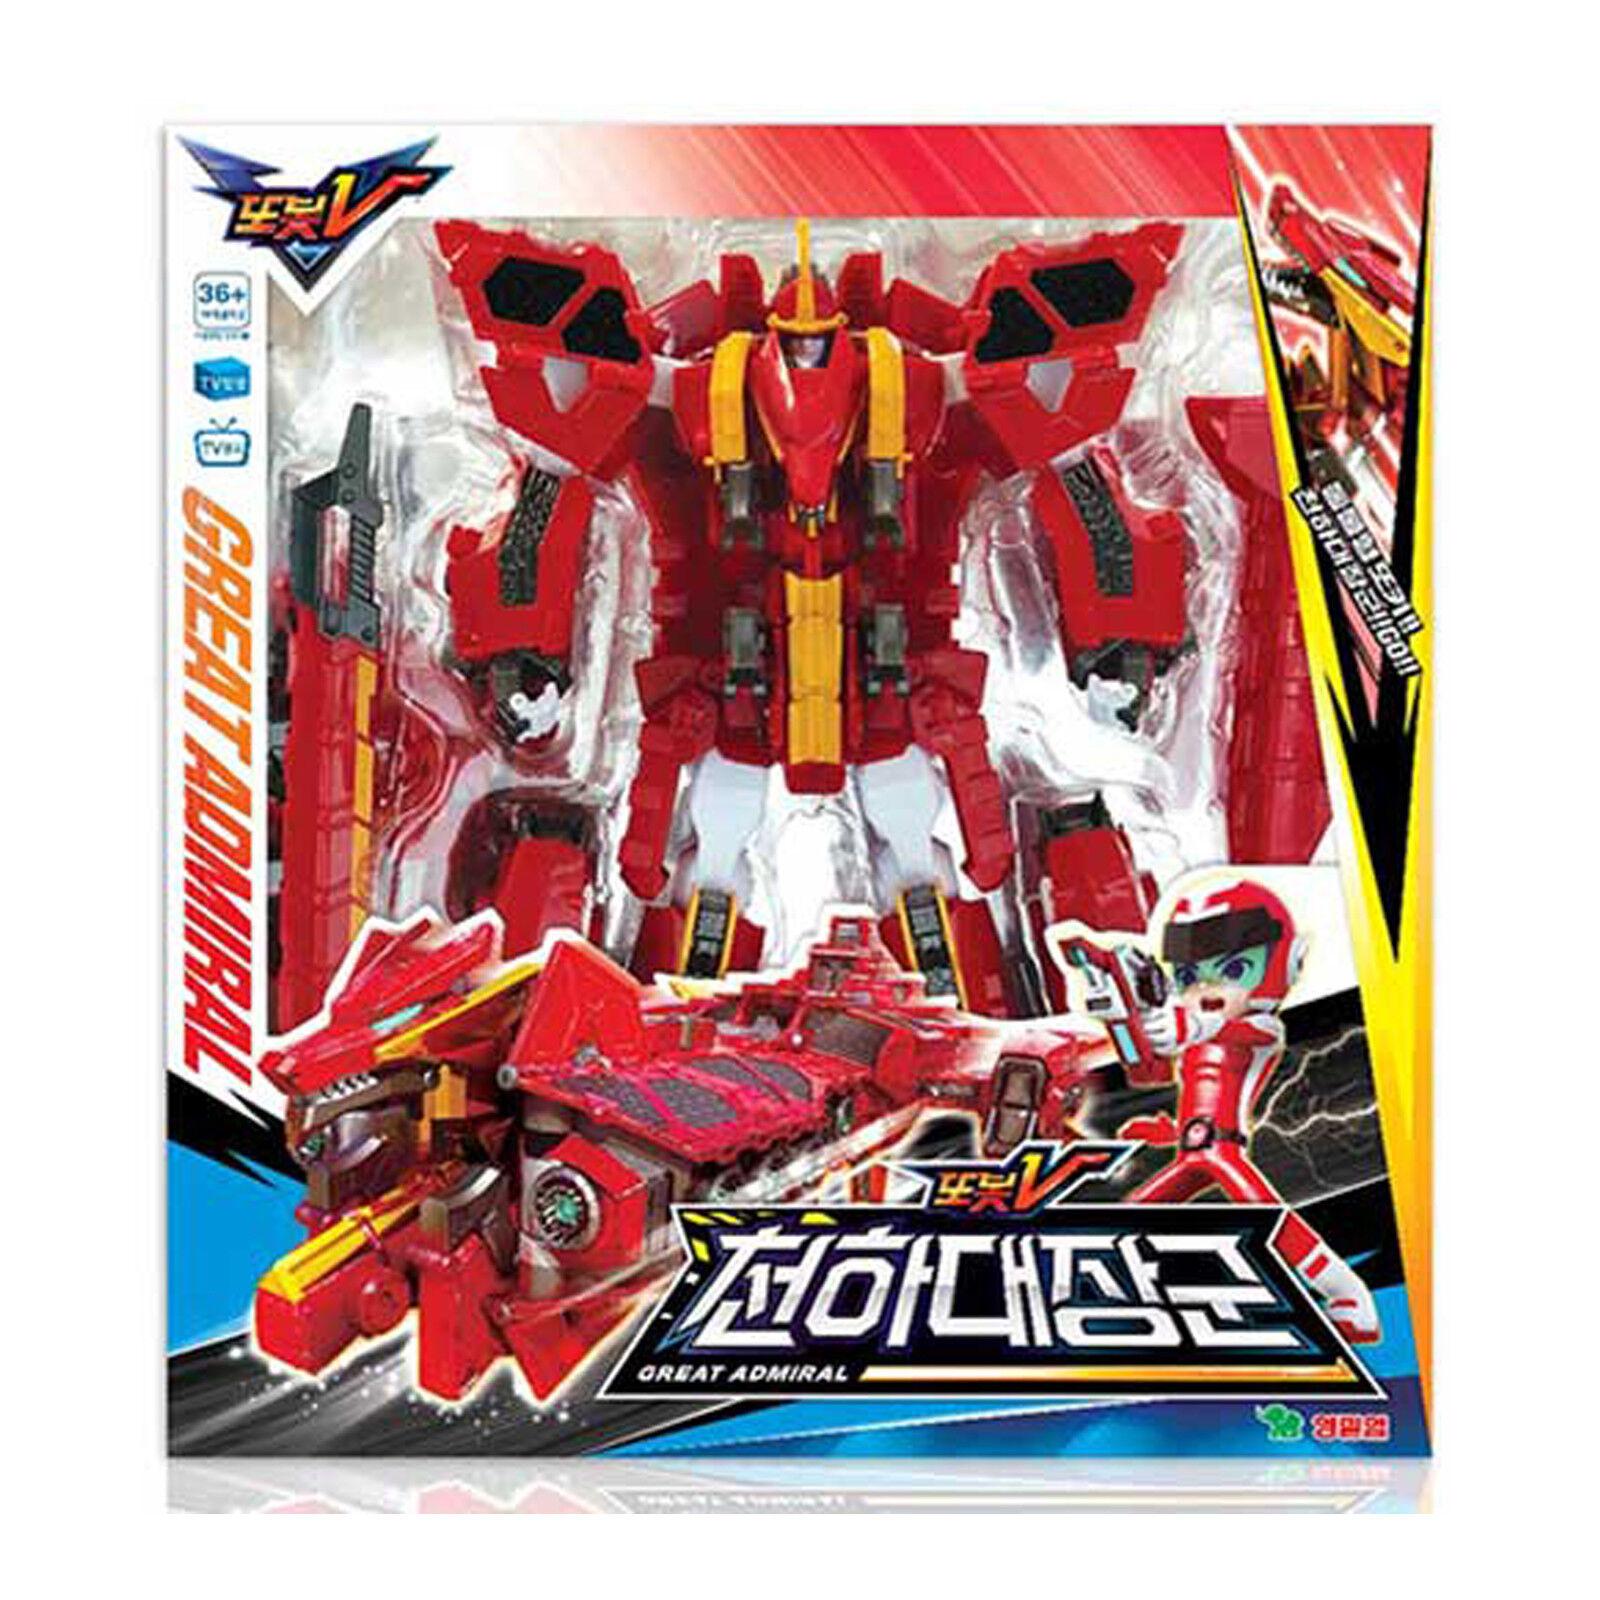 Tobot V Great Admiral Transformer Robot Car Toy Action Figure